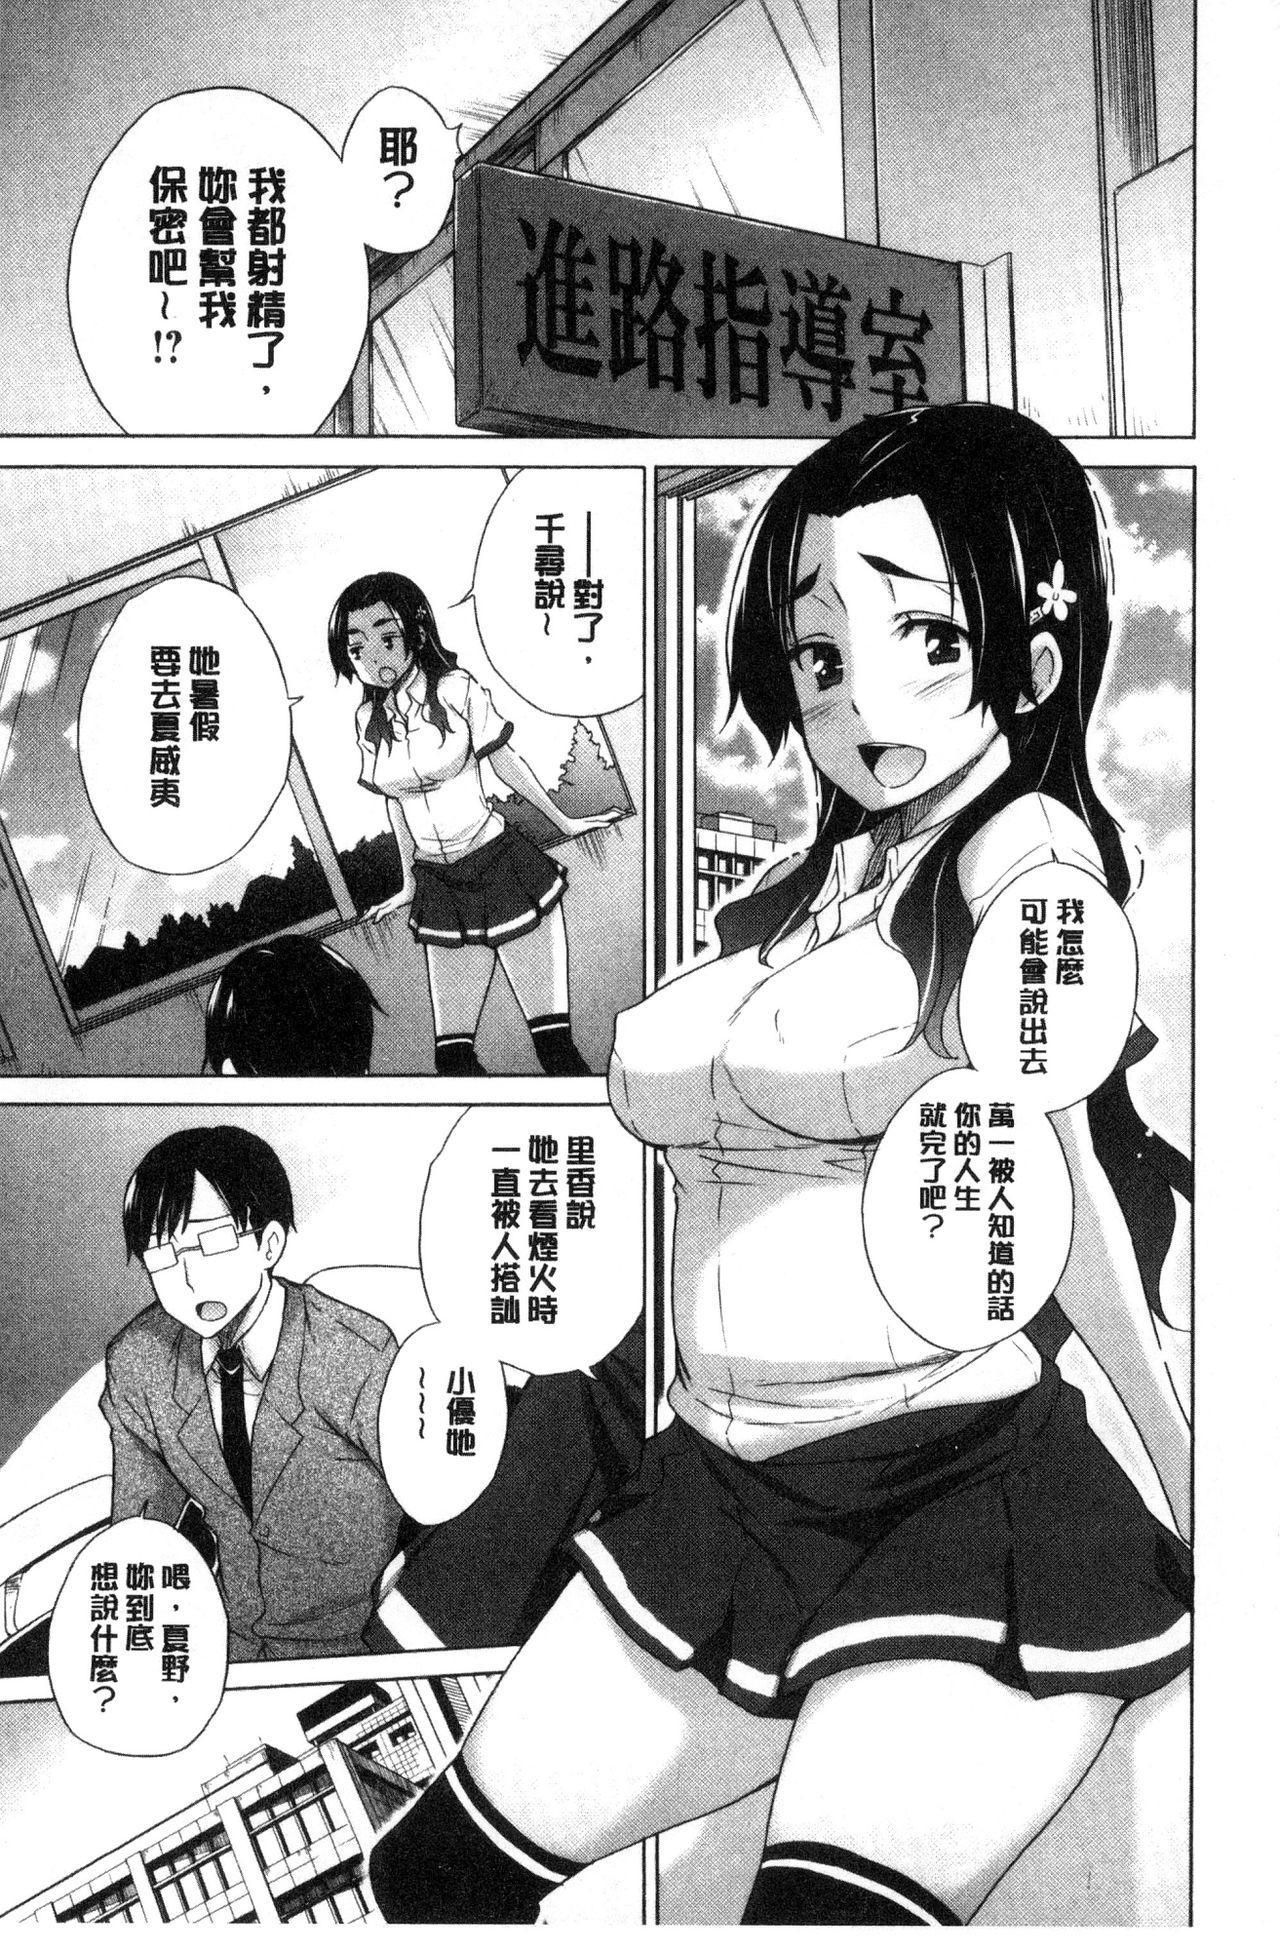 [Miyano Kintarou] Hishoujo List - The Non-Virgin List  | 非處女的名單 [Chinese] 126